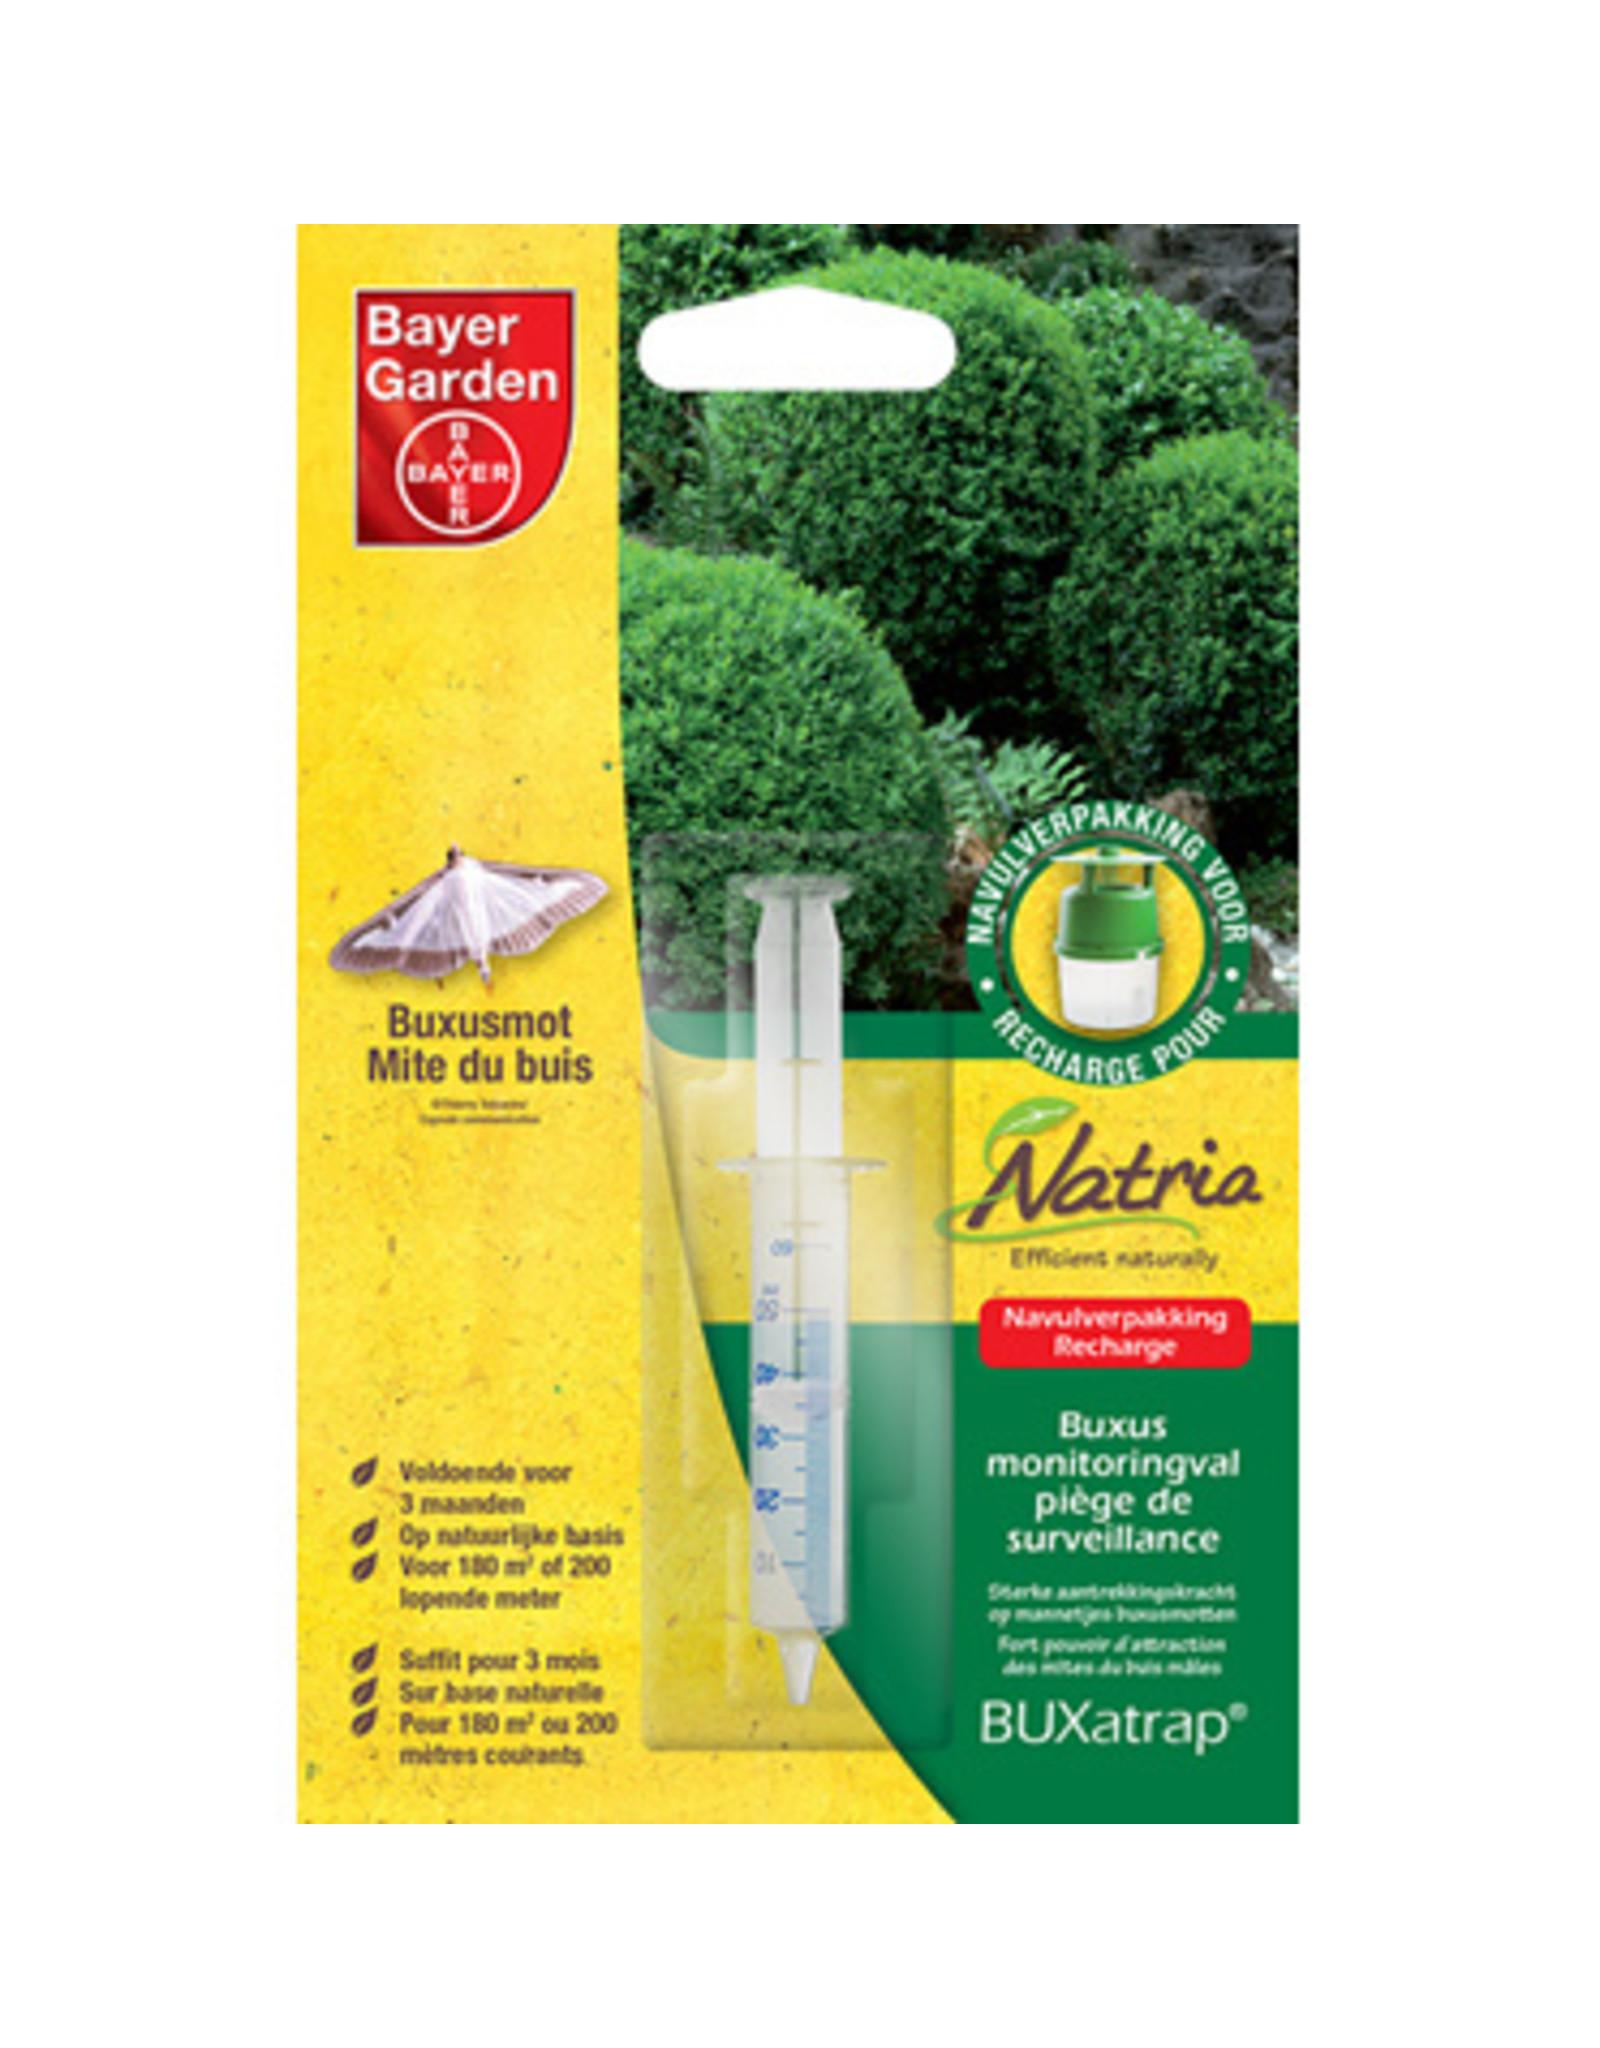 Bayer Garden Natria Navulverpakking Buxatrap® Buxus Monitoringval tegen buxusmot